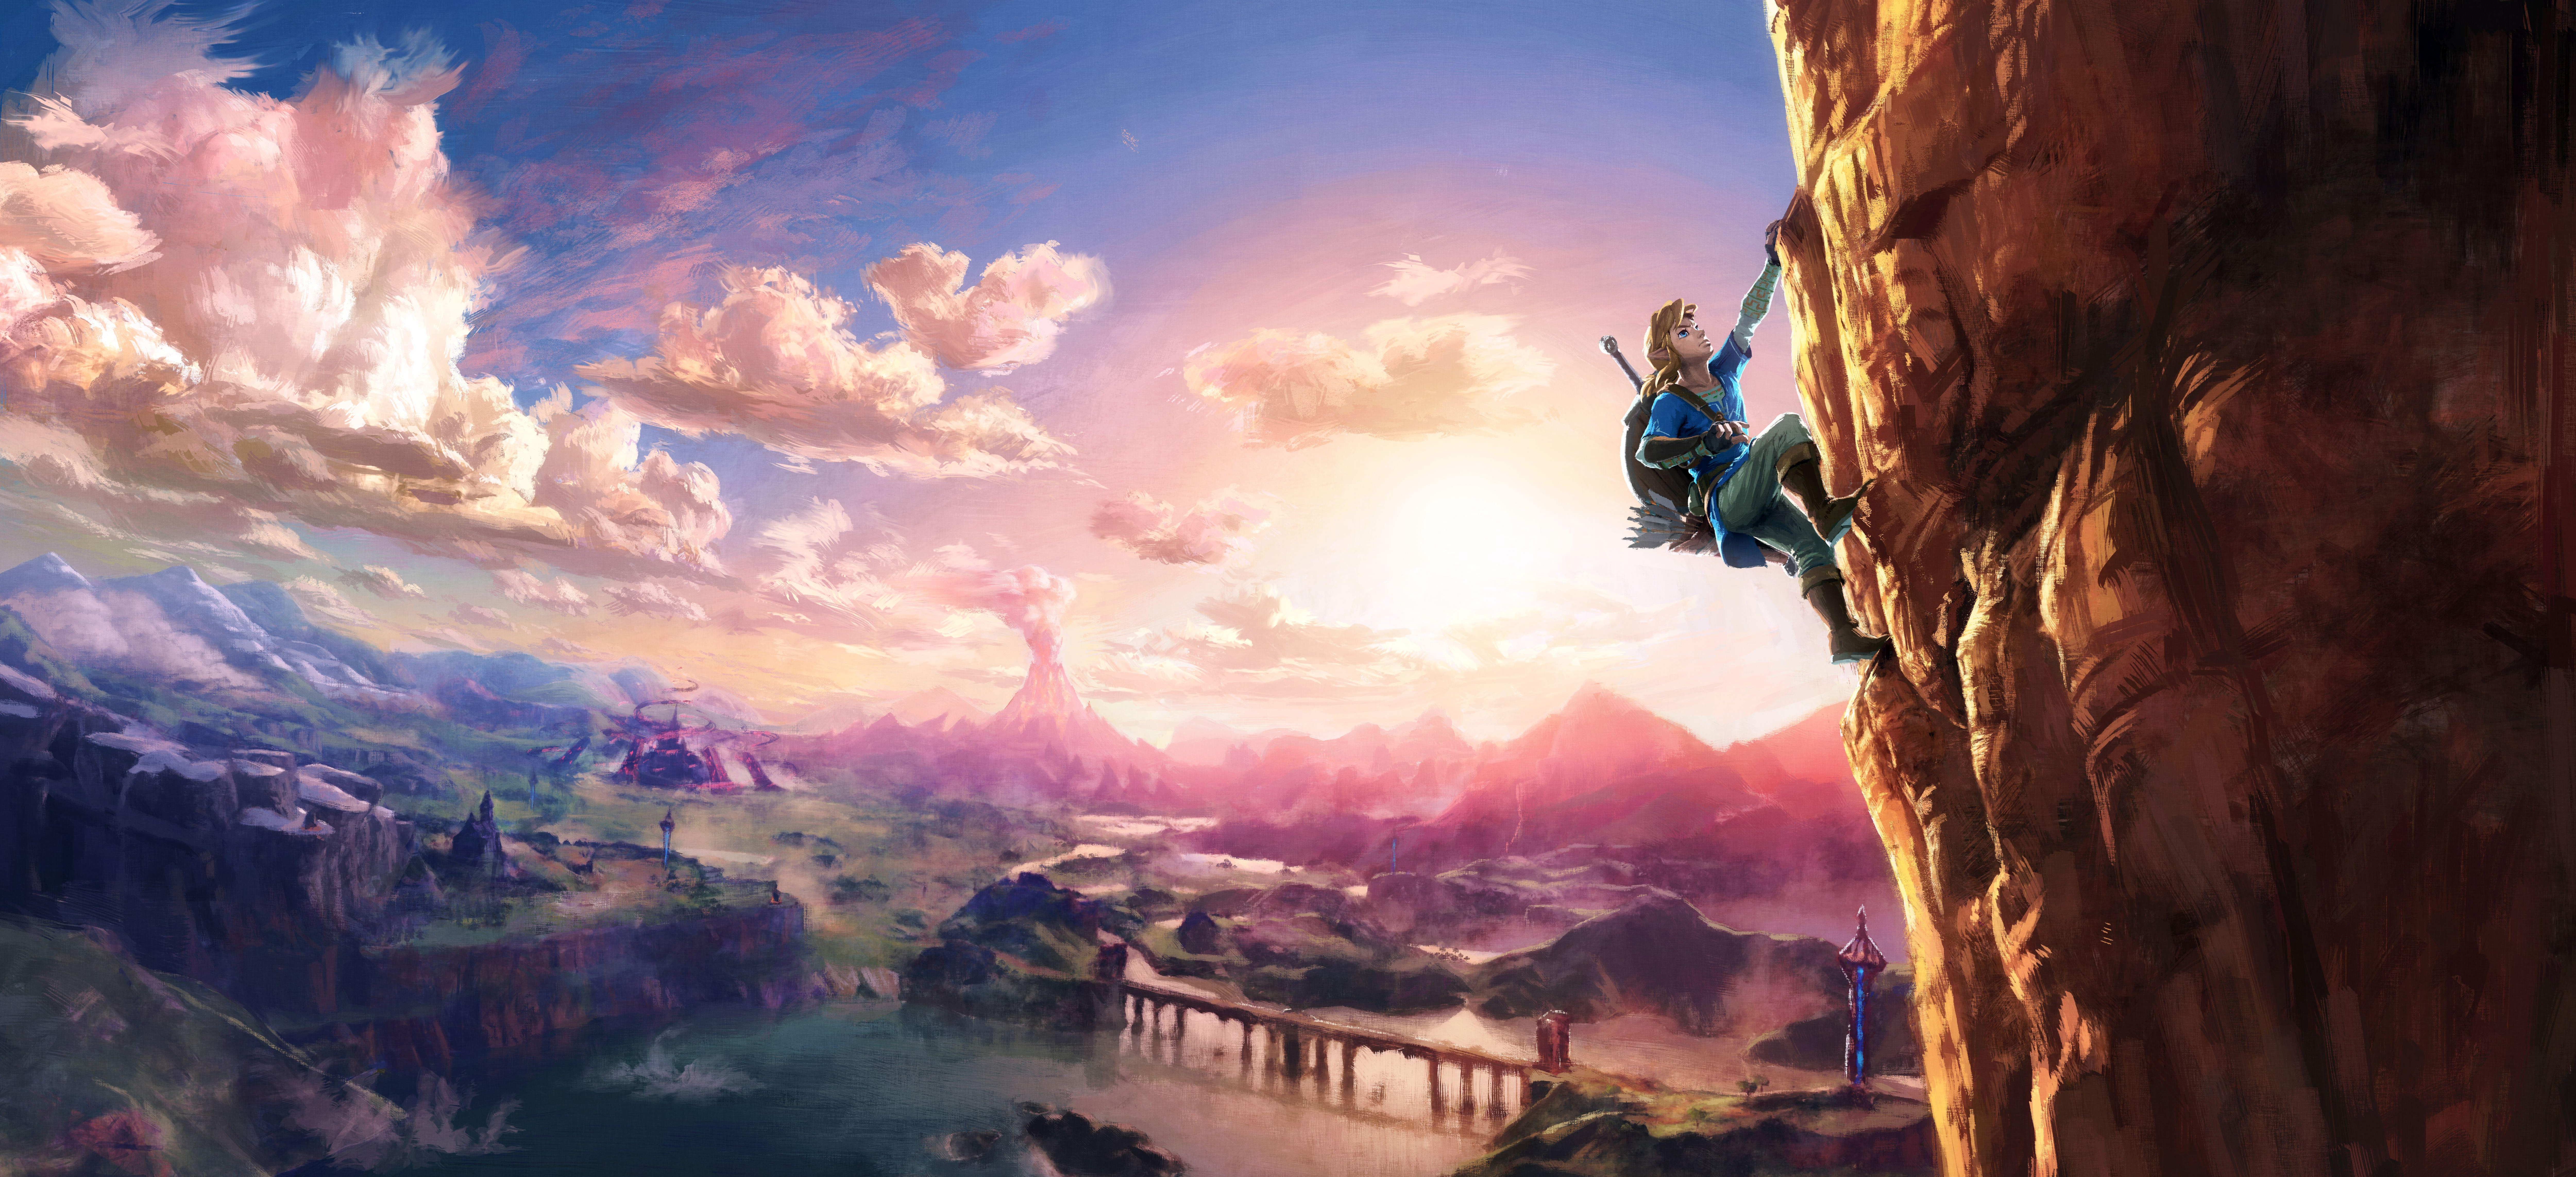 140 The Legend of Zelda Breath of the Wild HD Wallpapers 10897x4981